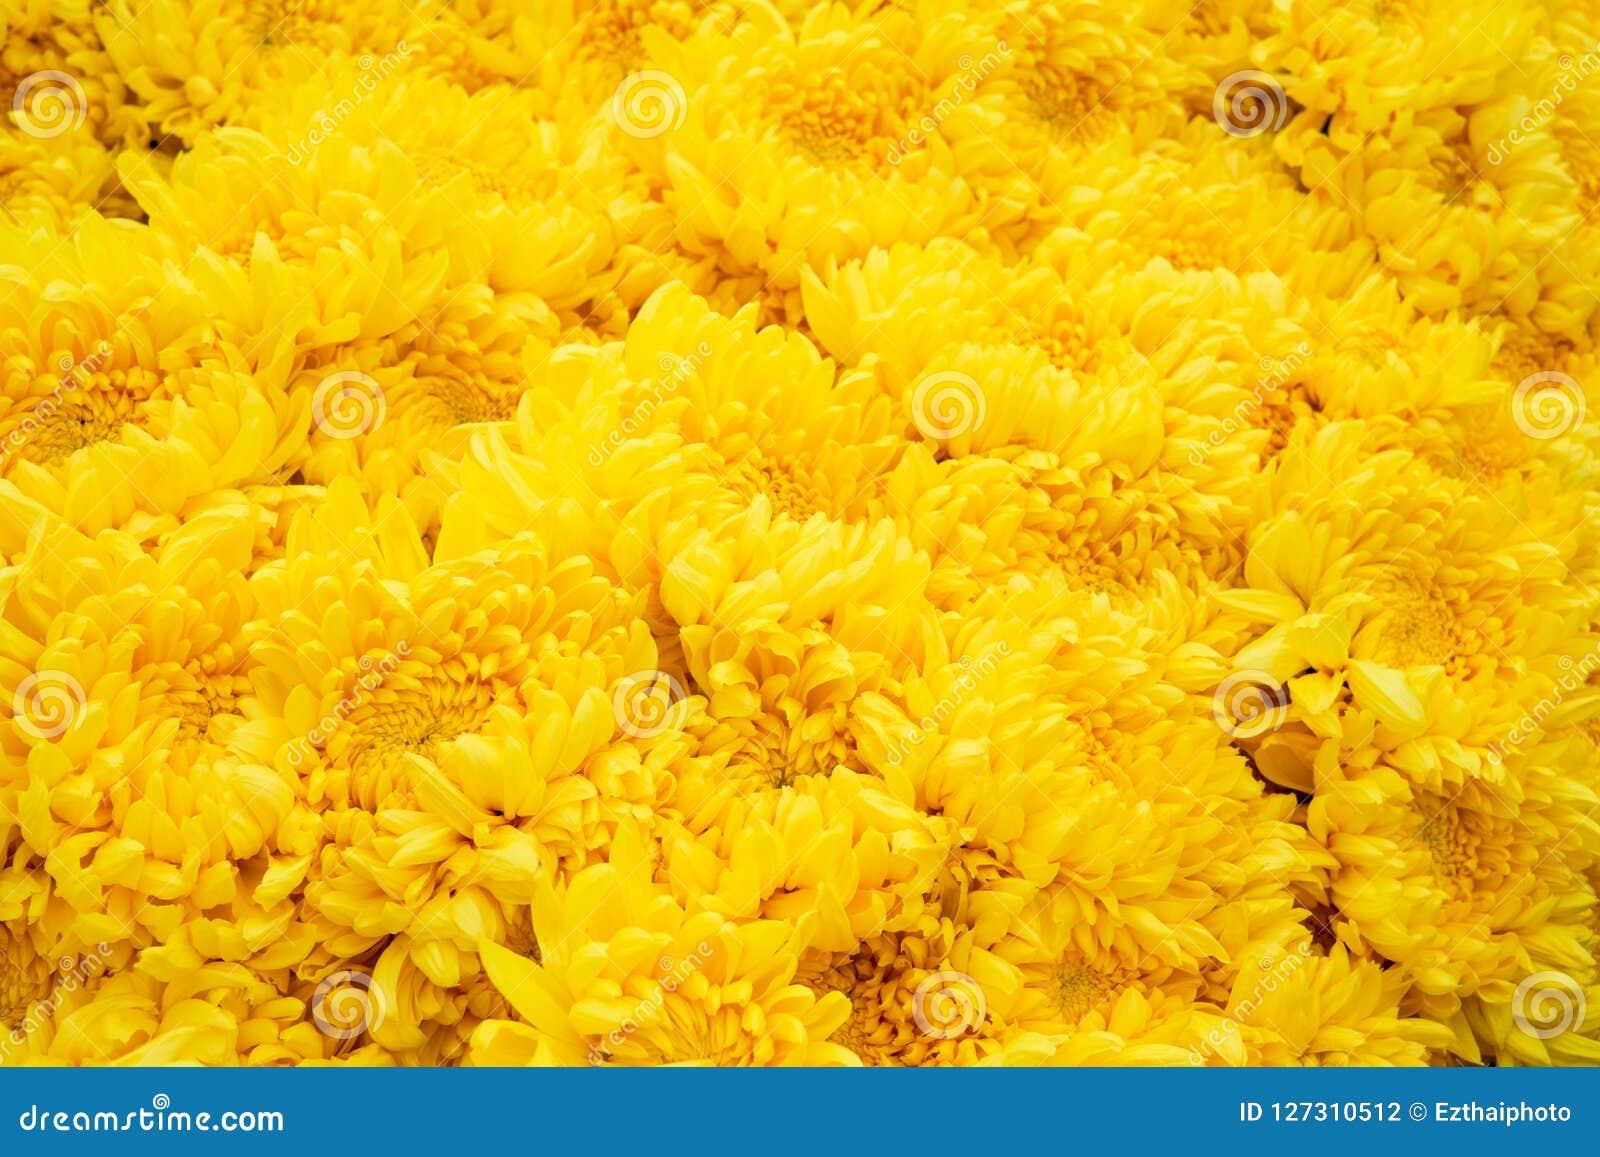 Selective focus beautiful chrysanthemums flowers texture backgr